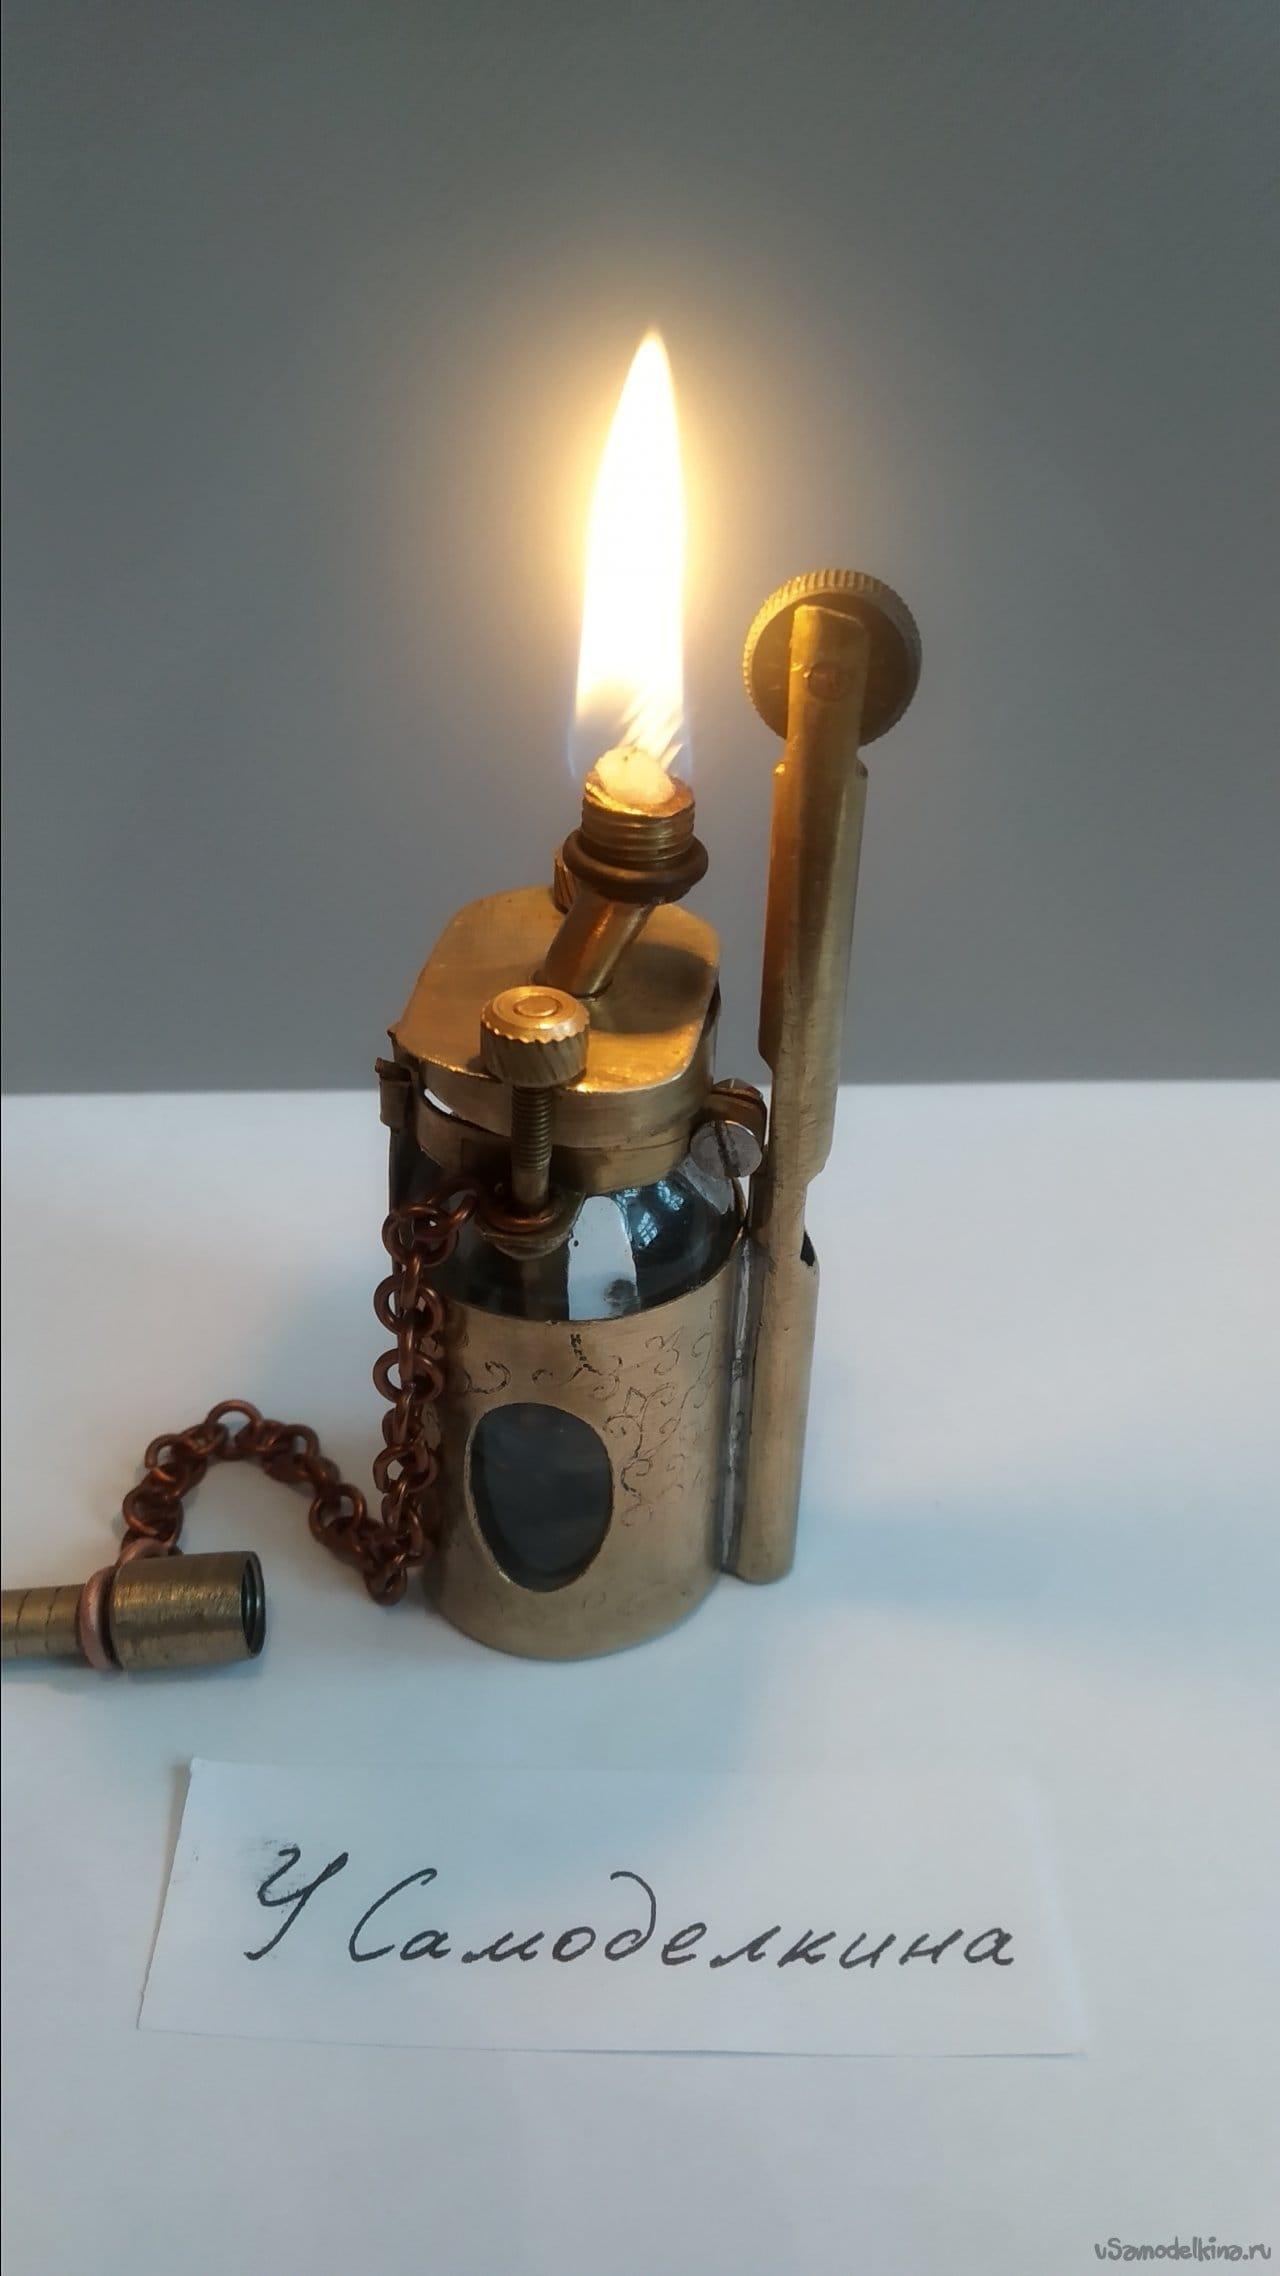 Homemade gasoline lighter made of glass vial and brass